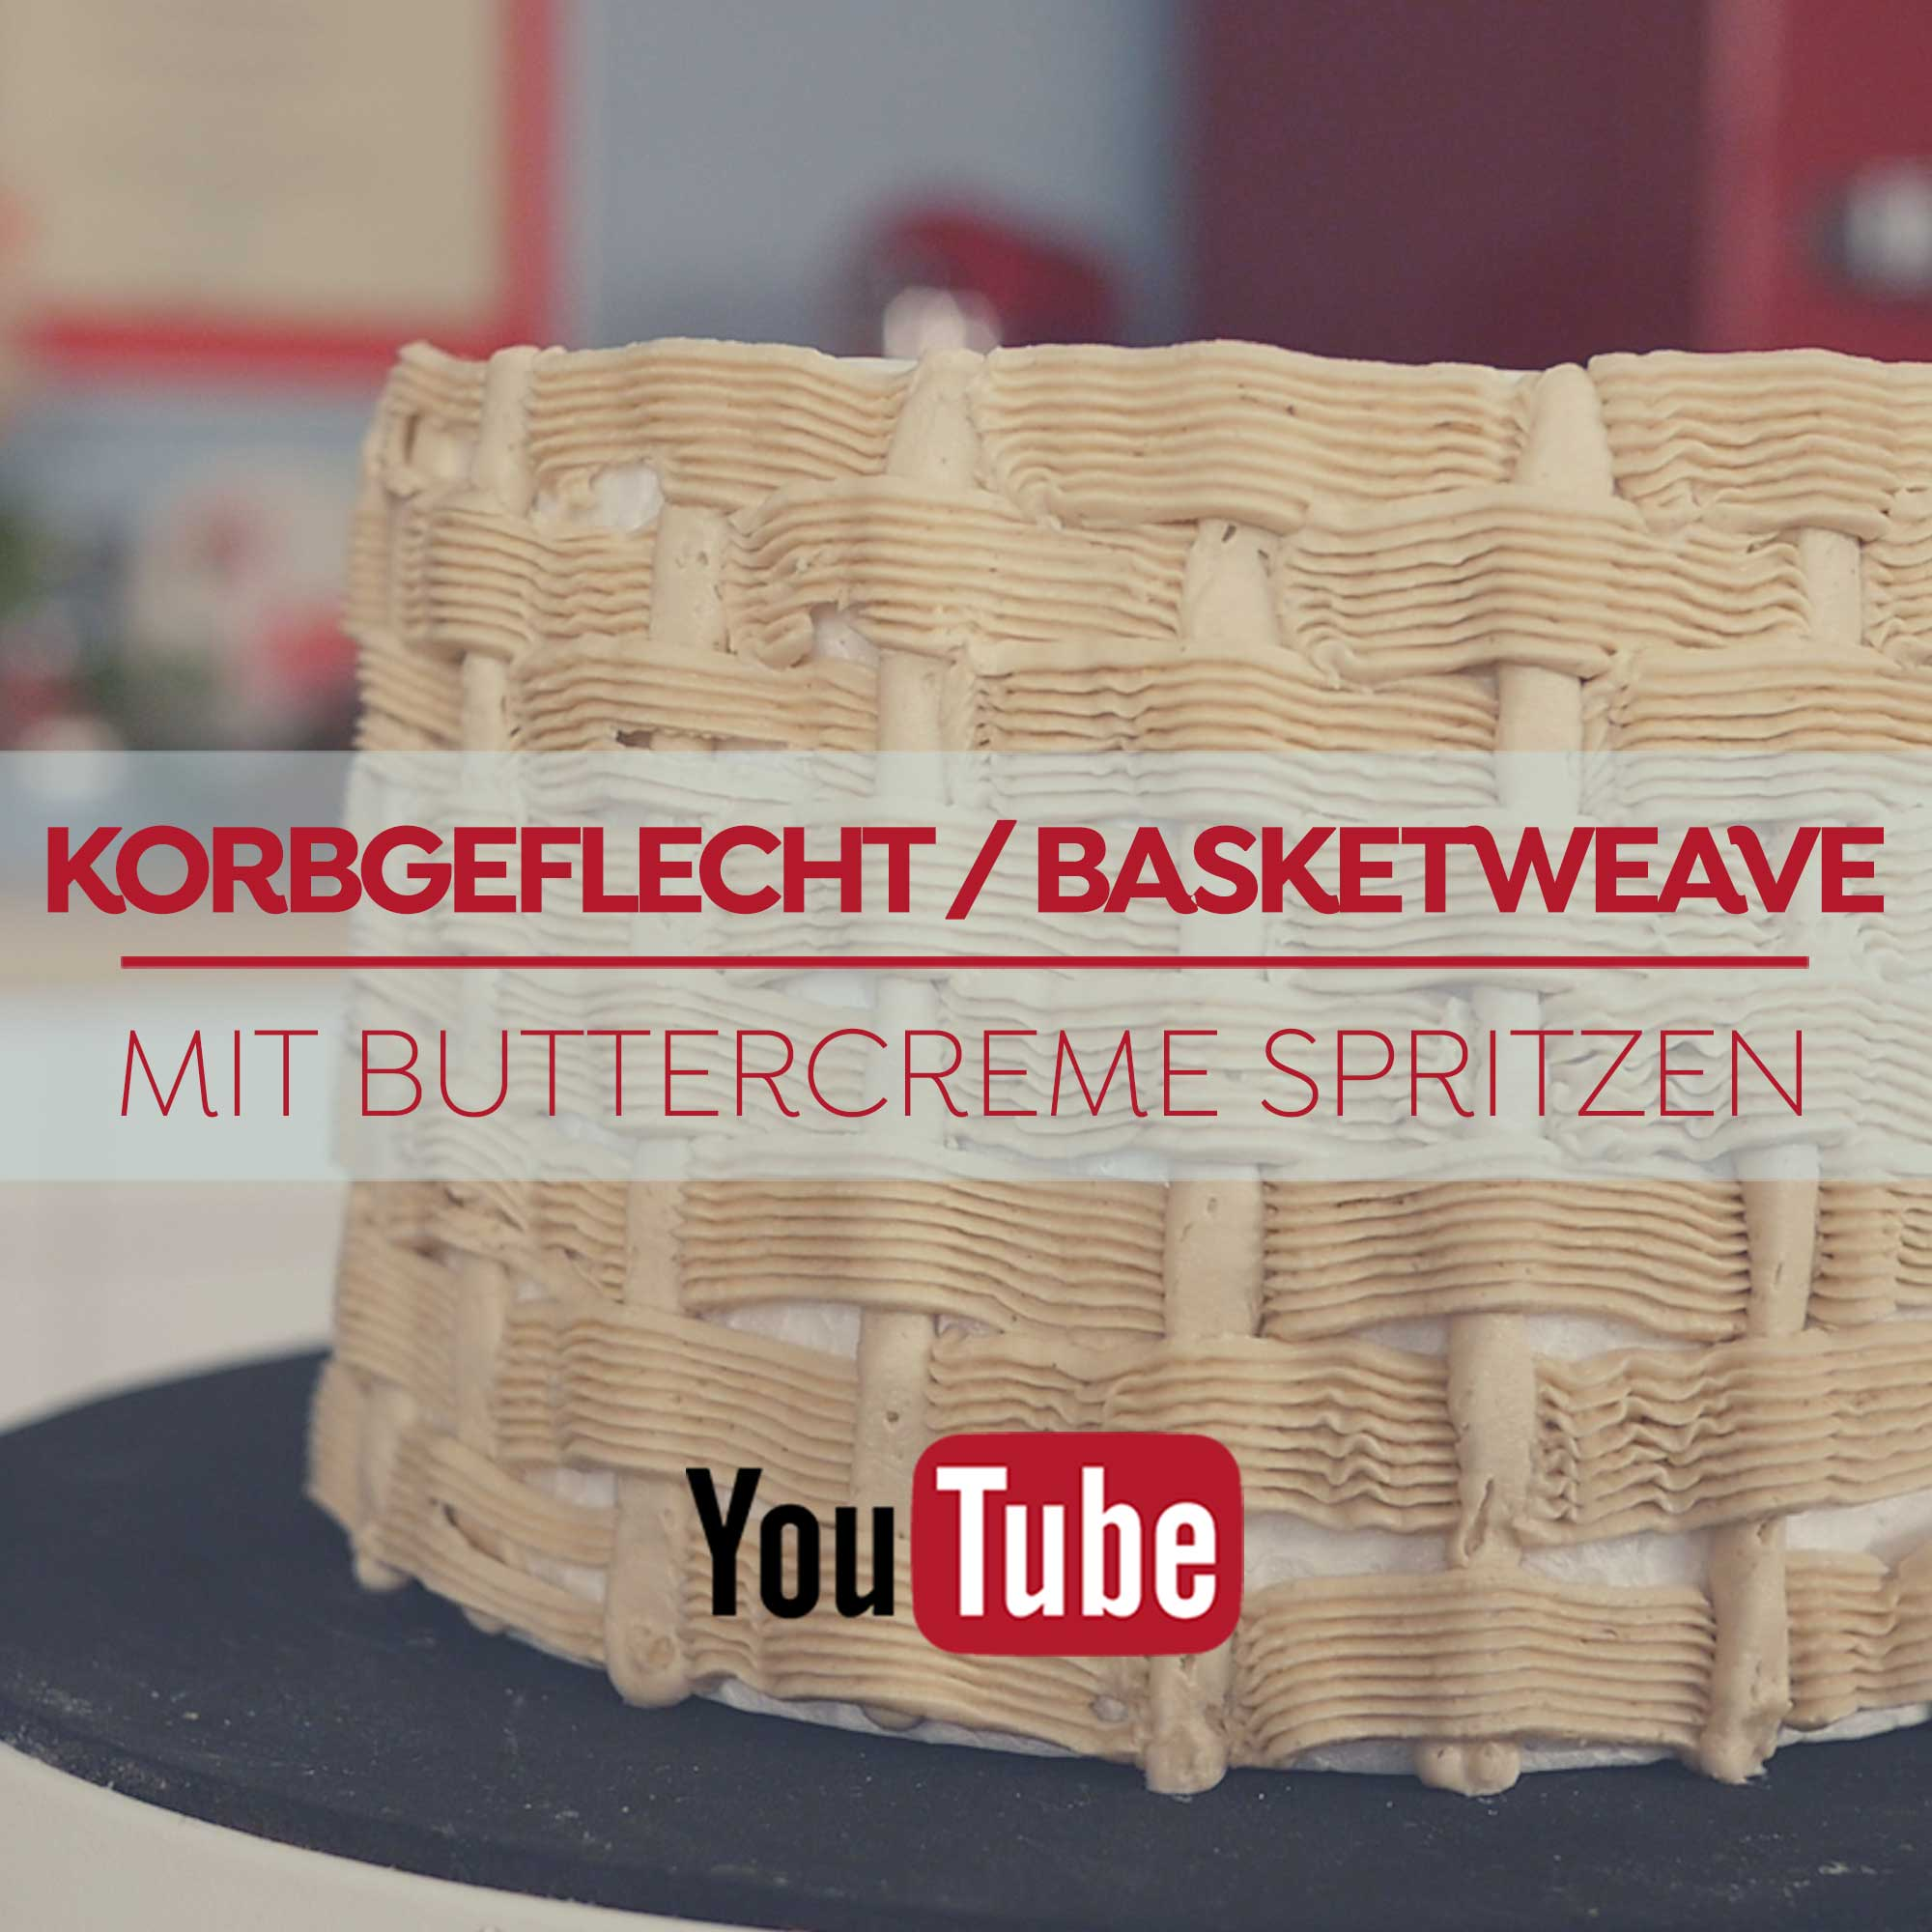 Korbgeflecht / Basketweave mit Buttercreme spritzen